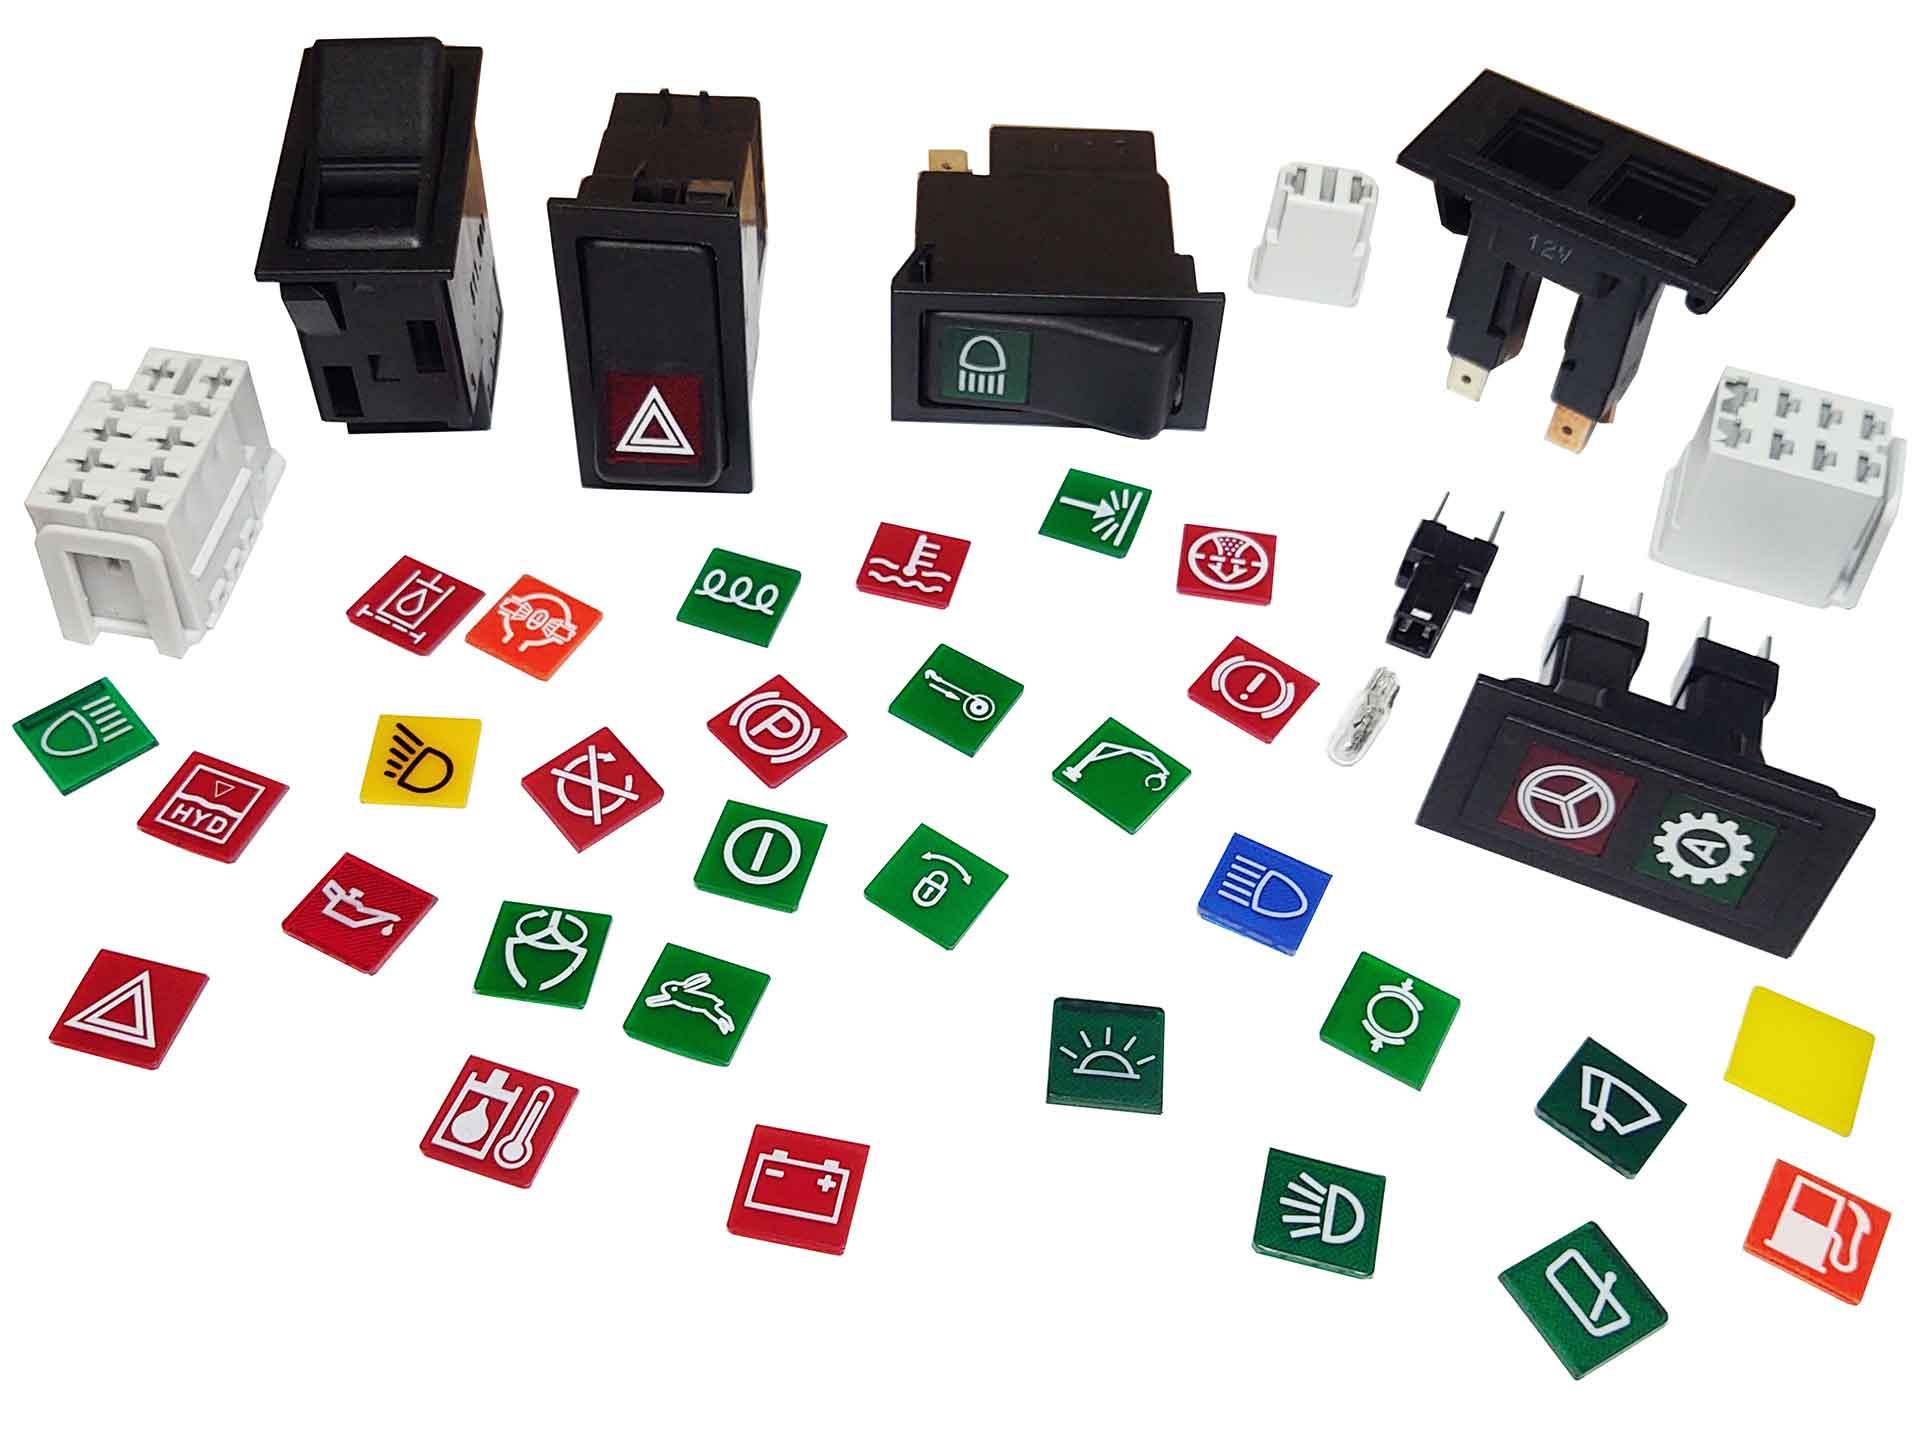 SWF / Valeo switches, indicators & accessories